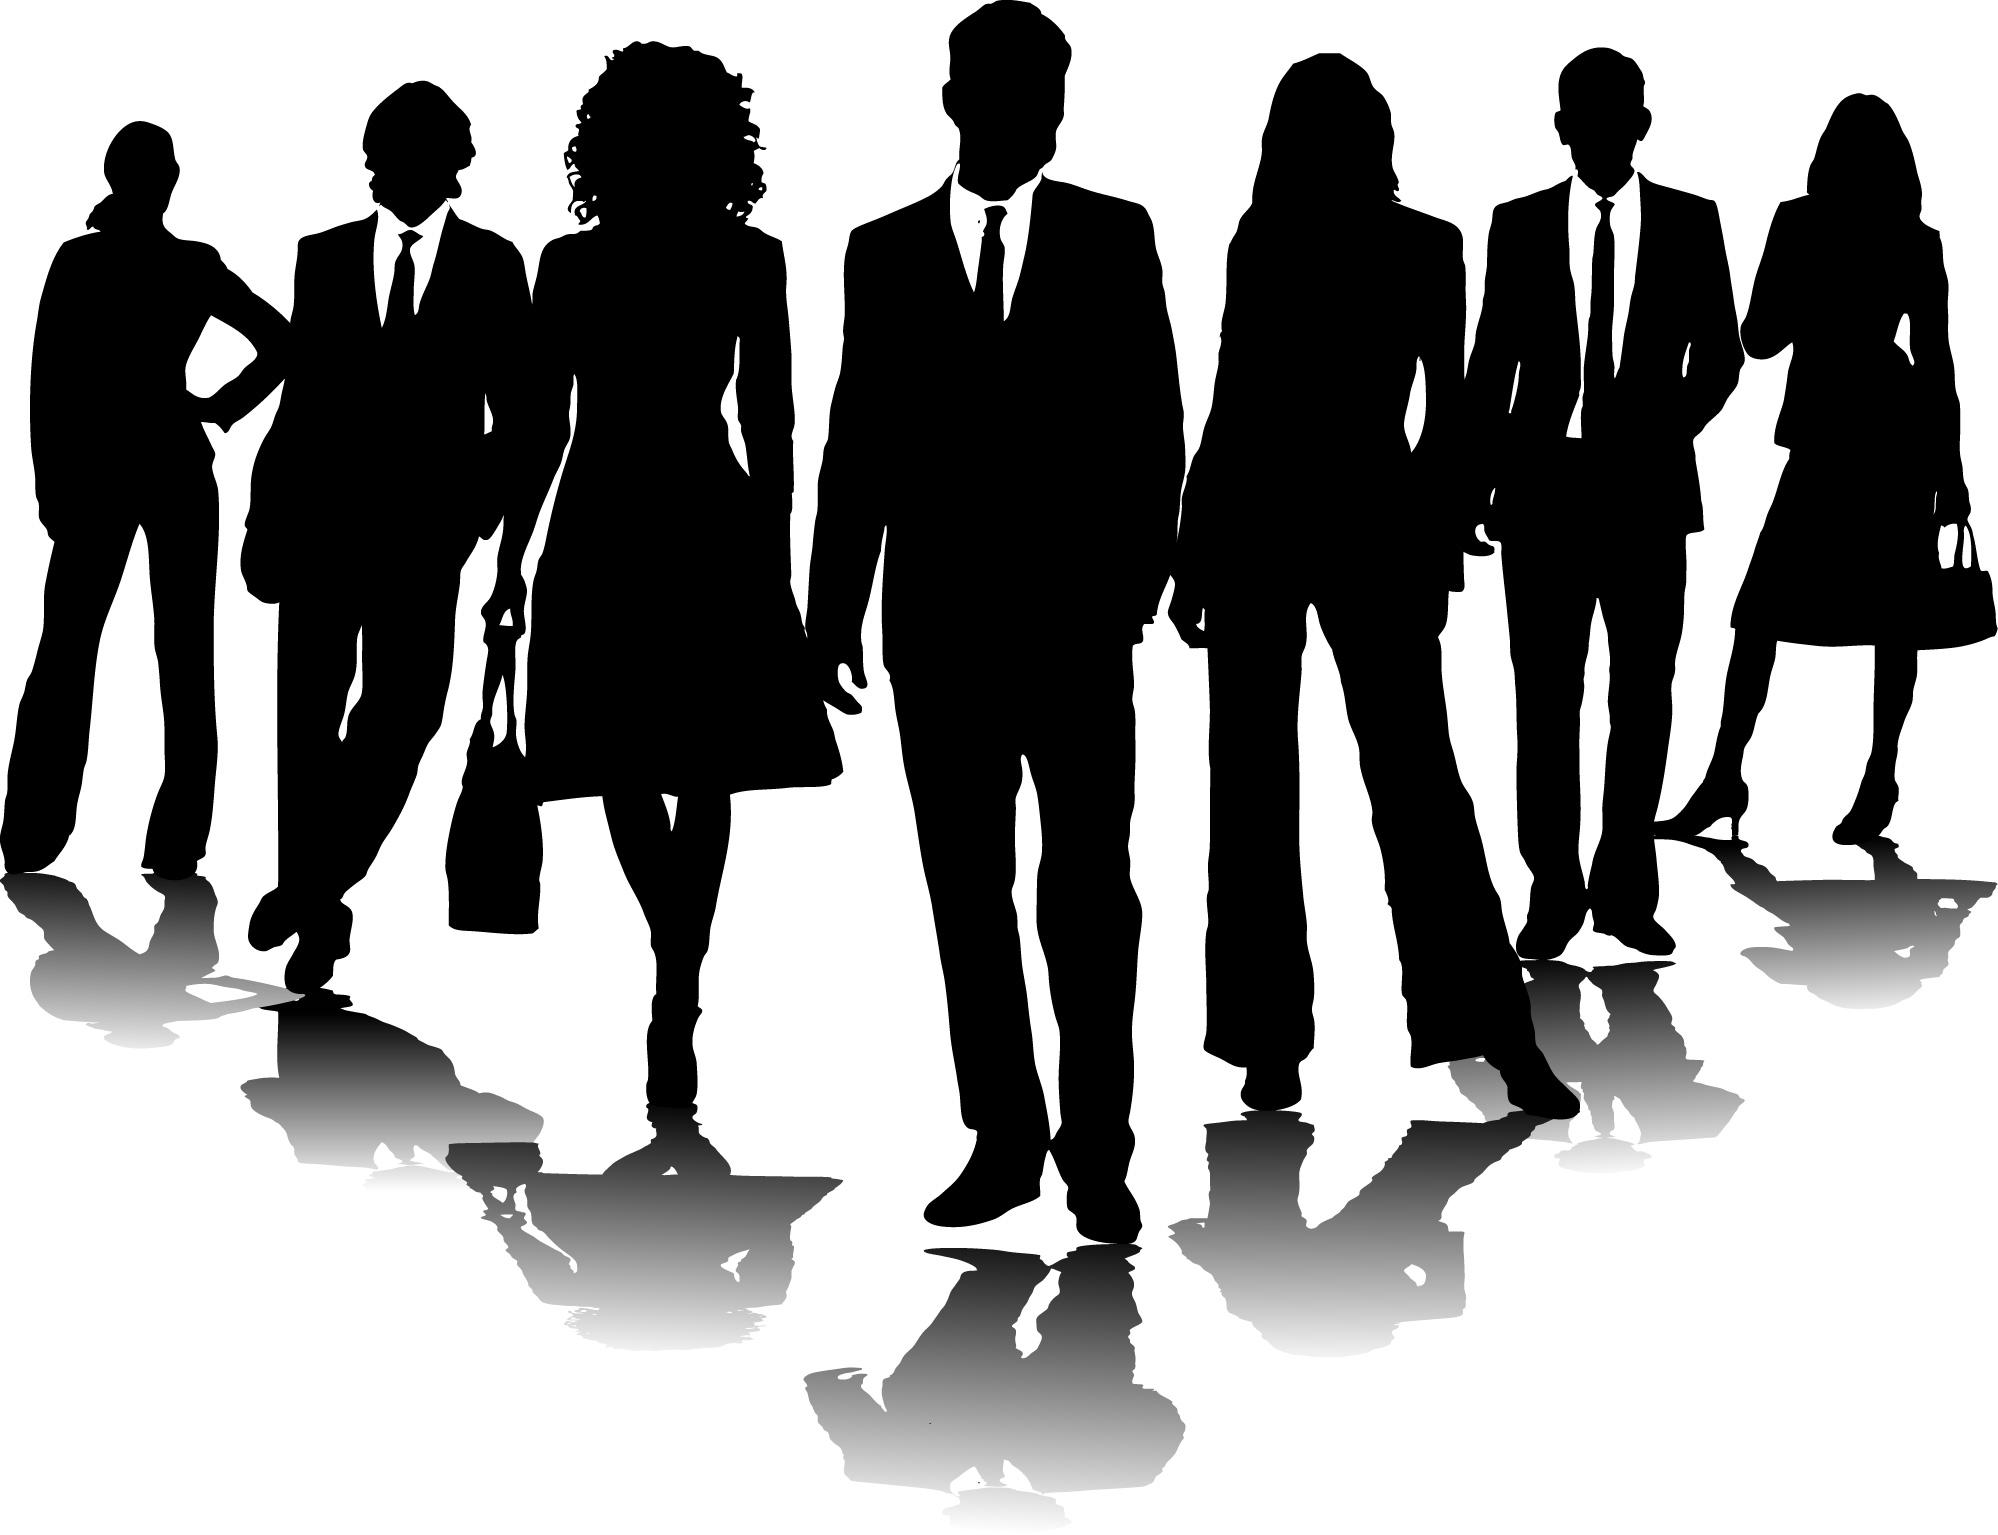 Clipart Business People-Clipart Business People-6